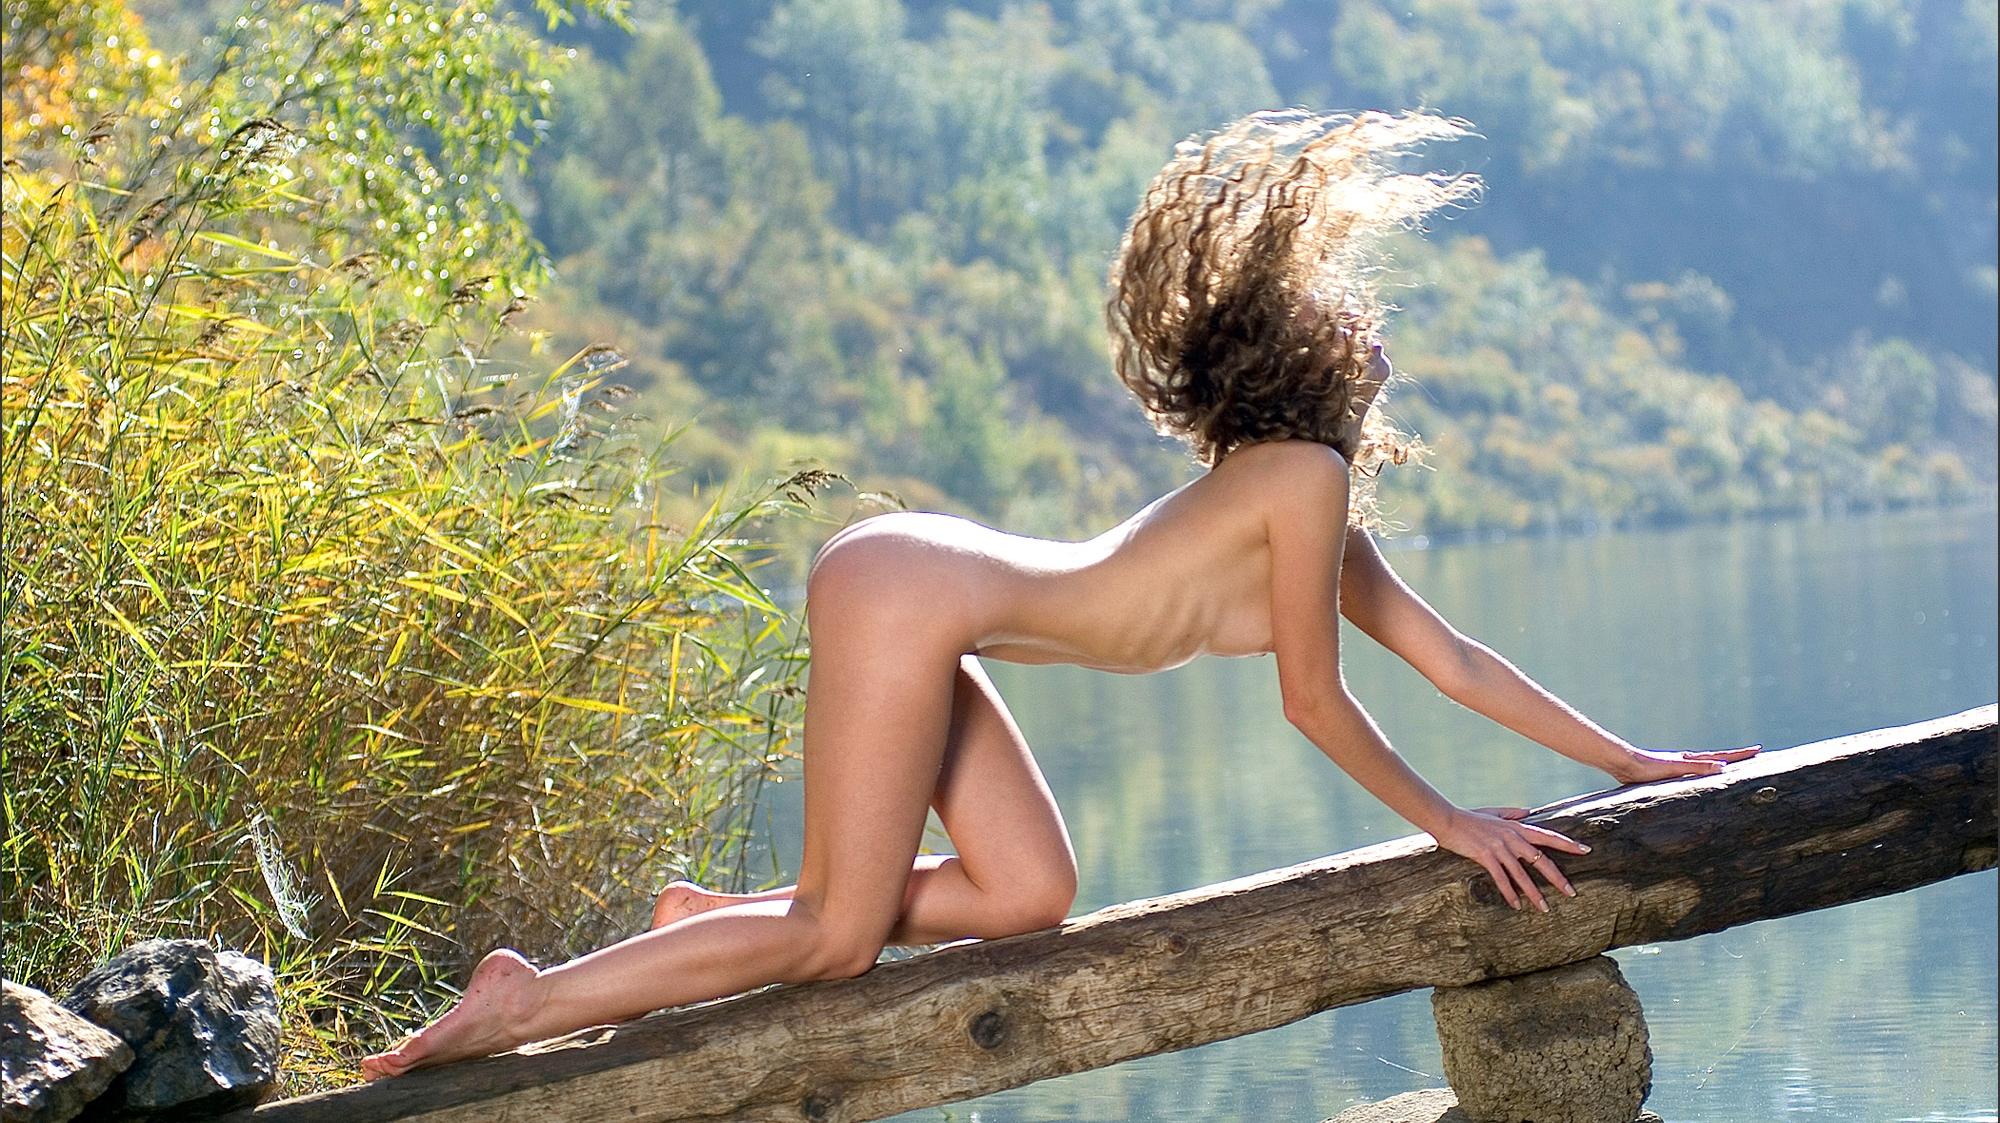 Фото голая девушка на бревнах 5 фотография